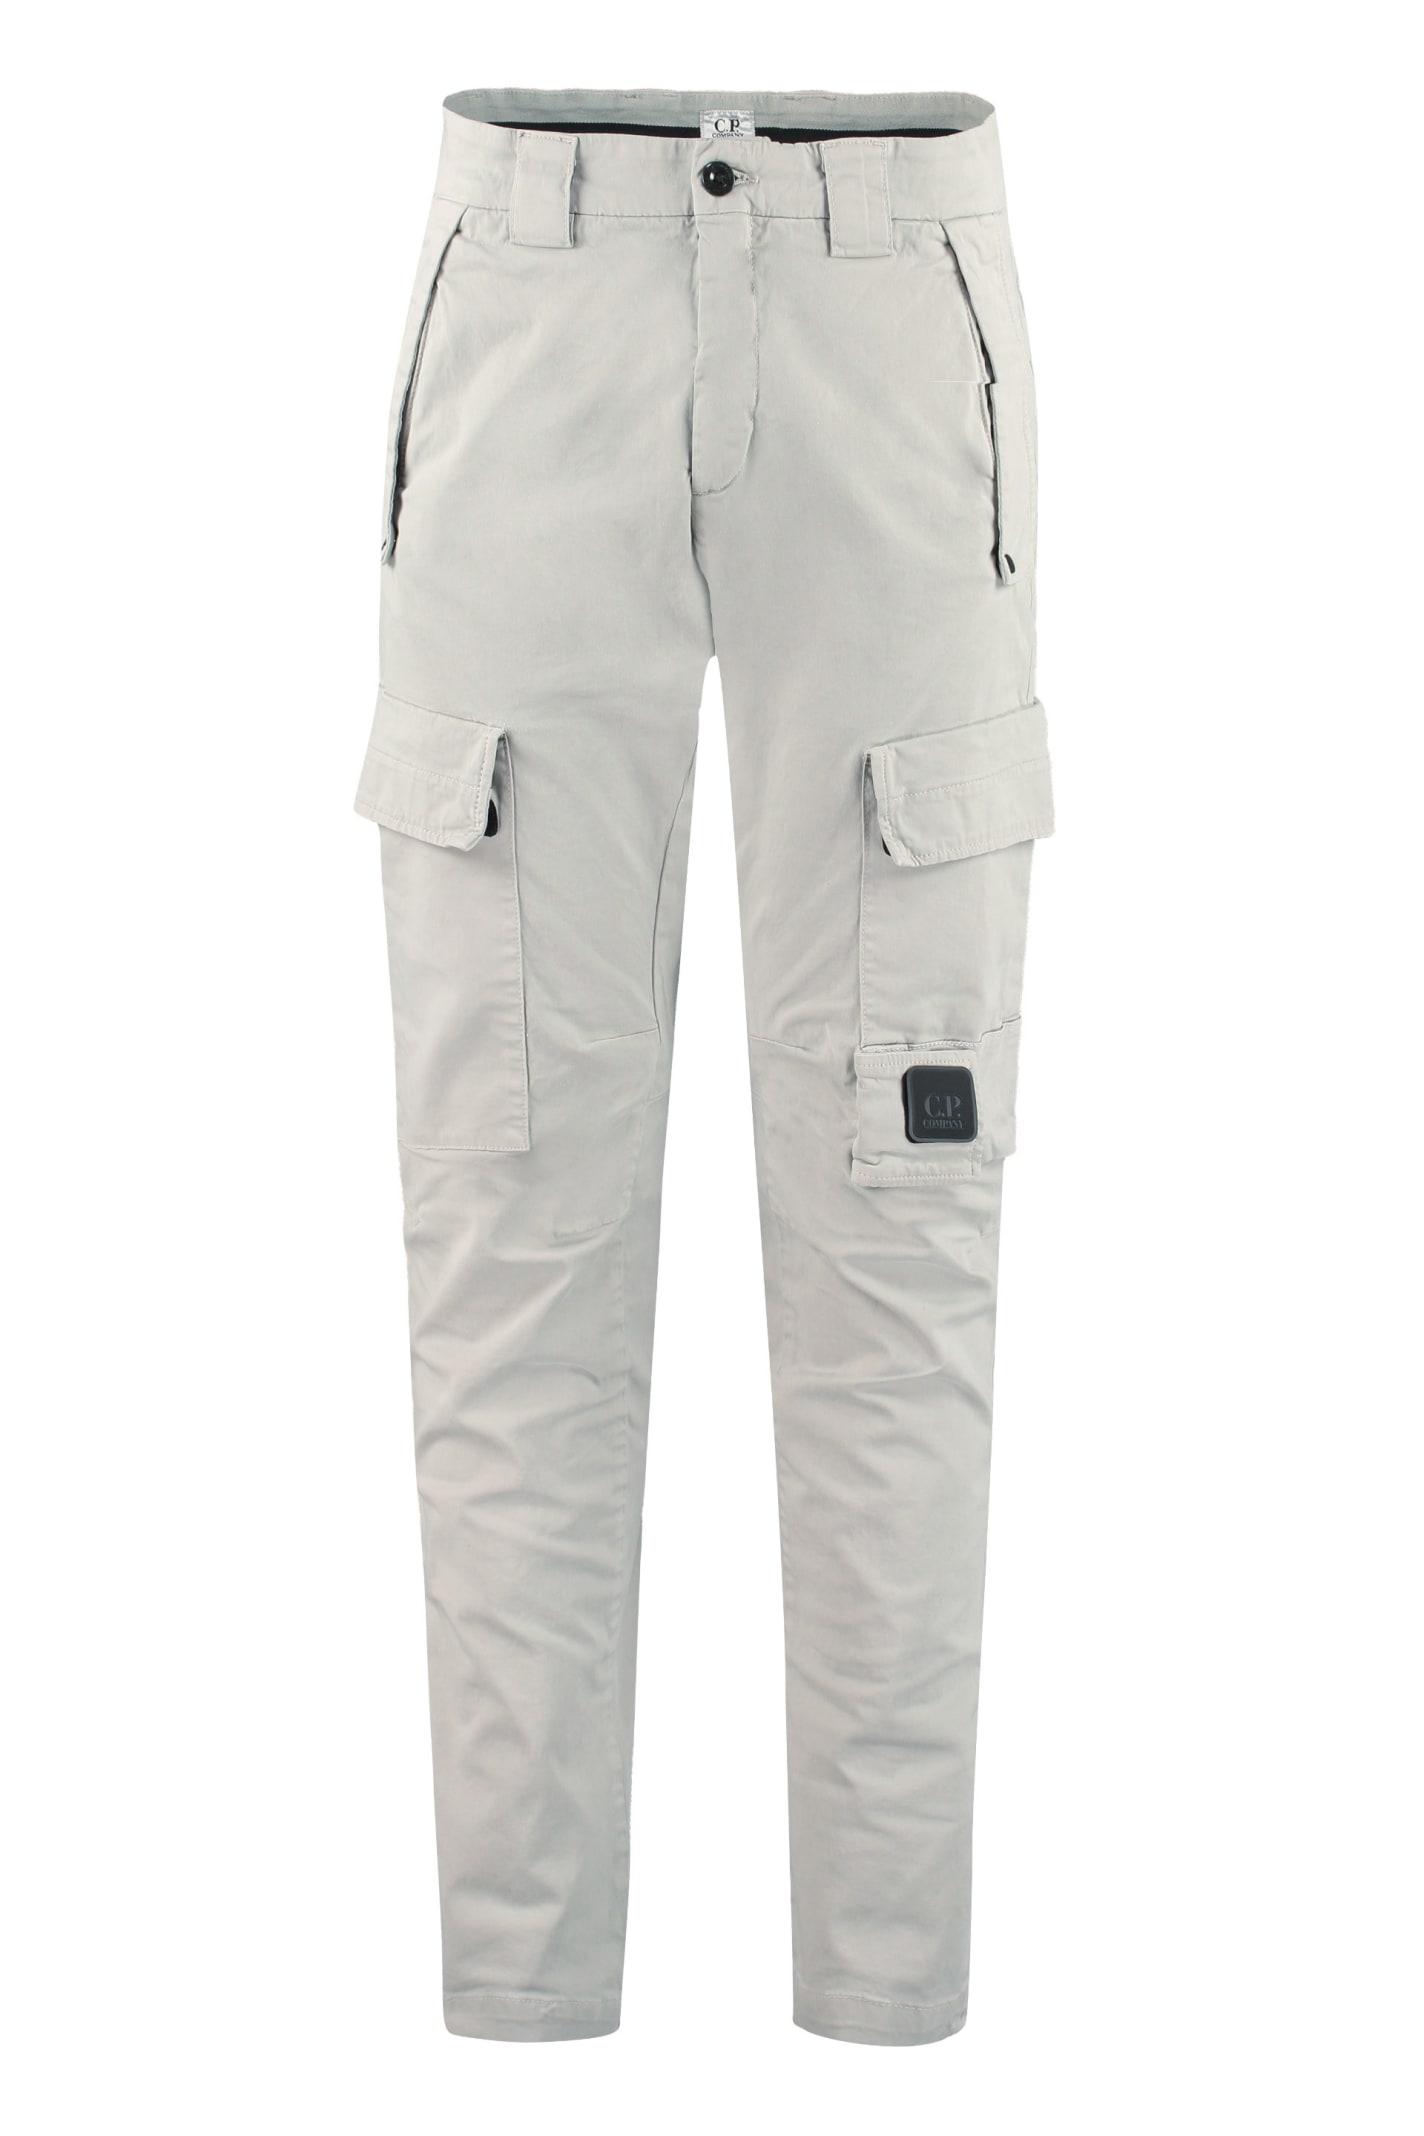 C.P. Company Cotton Cargo-trousers